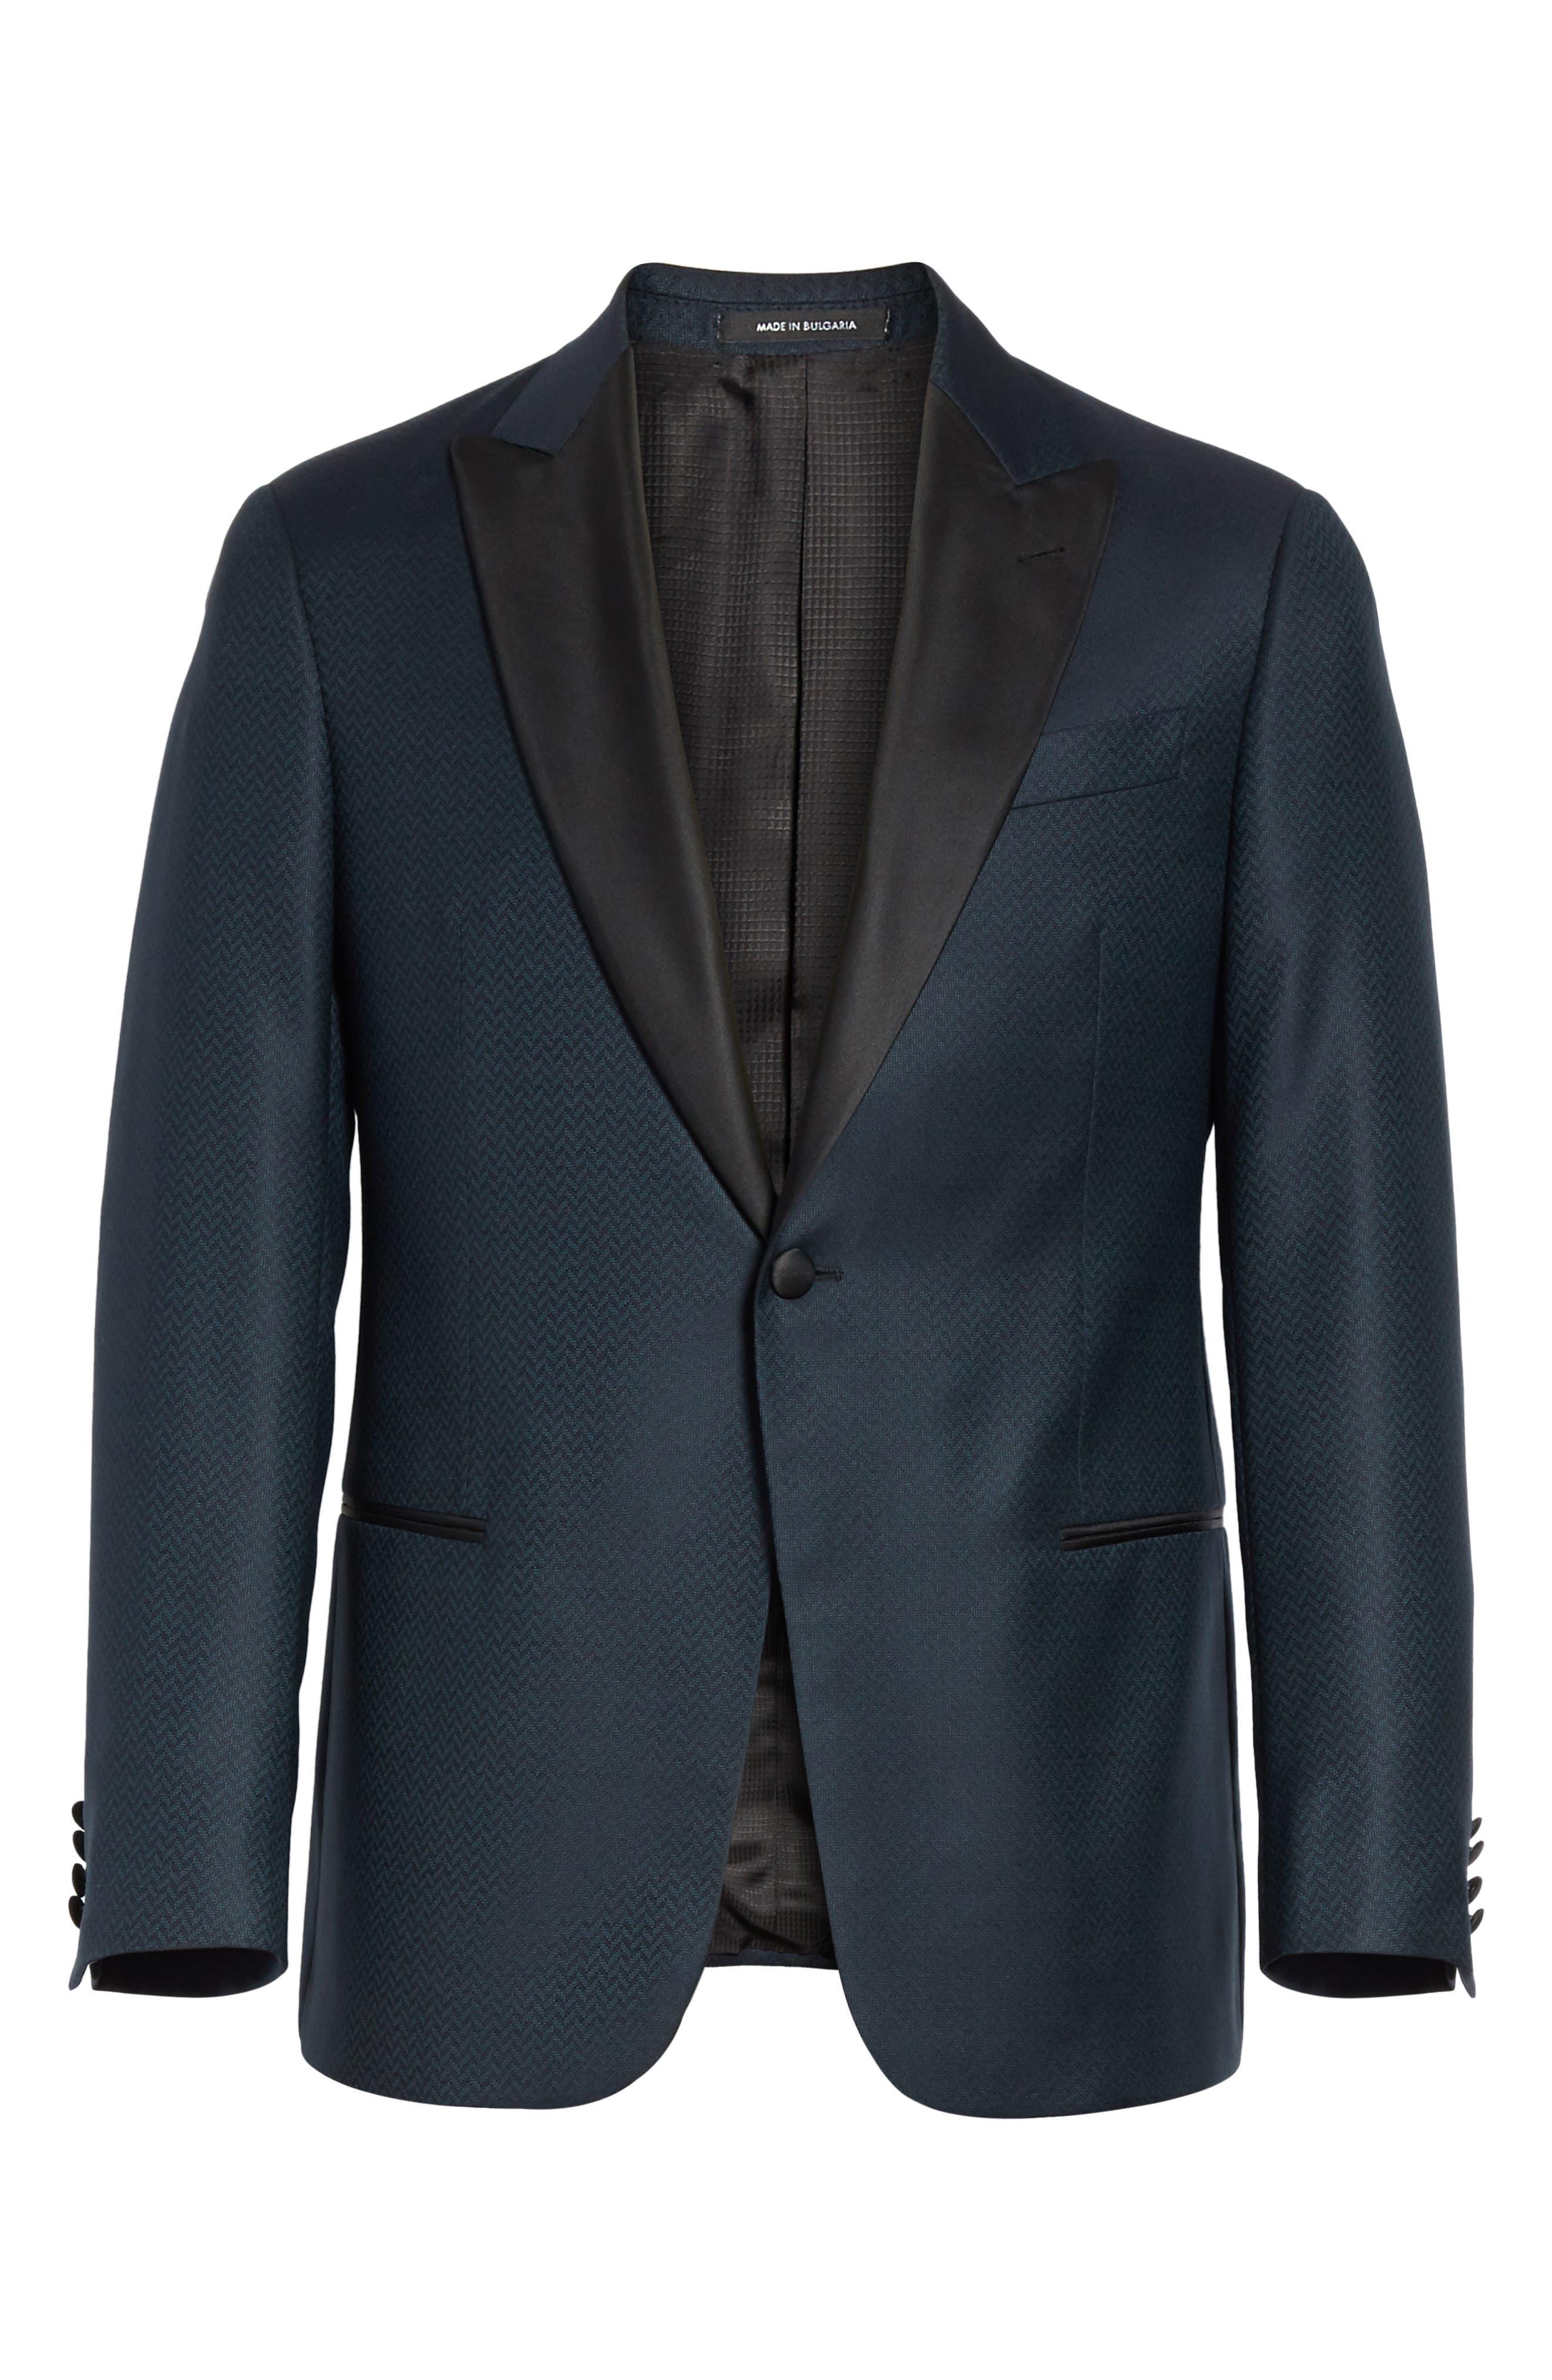 G-Line Trim Fit Wool Dinner Jacket,                             Alternate thumbnail 6, color,                             Blue